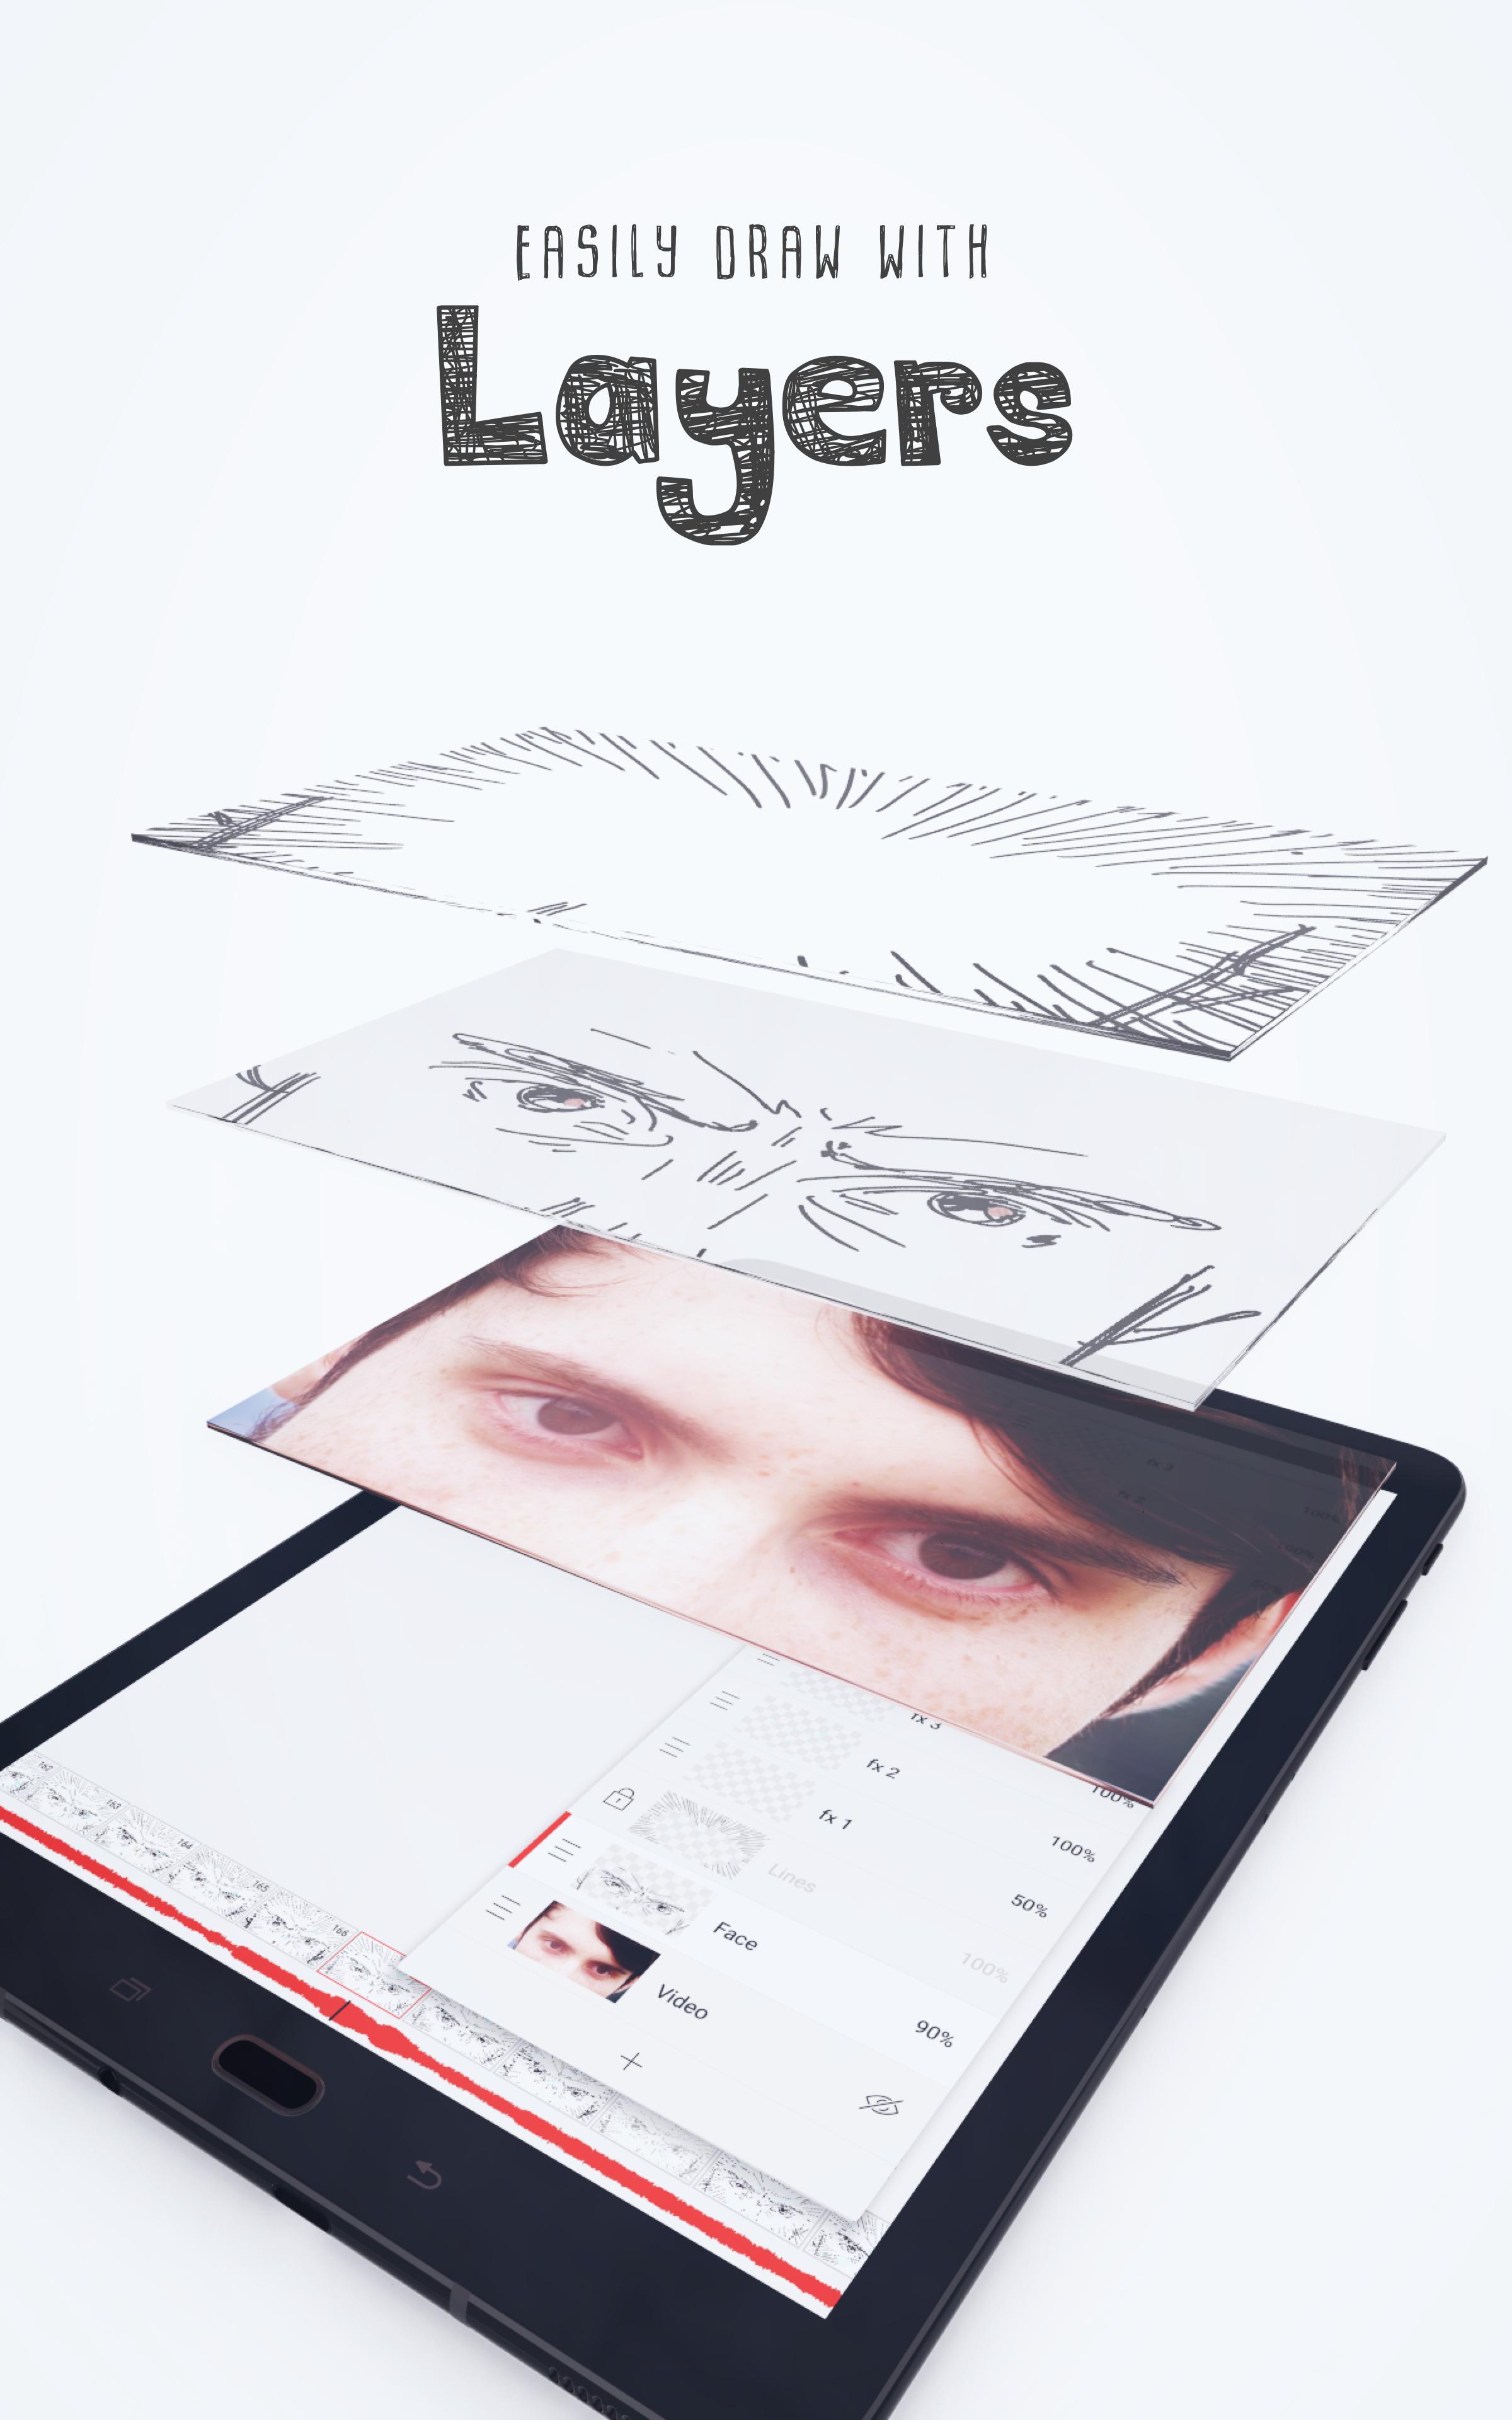 FlipaClip poster